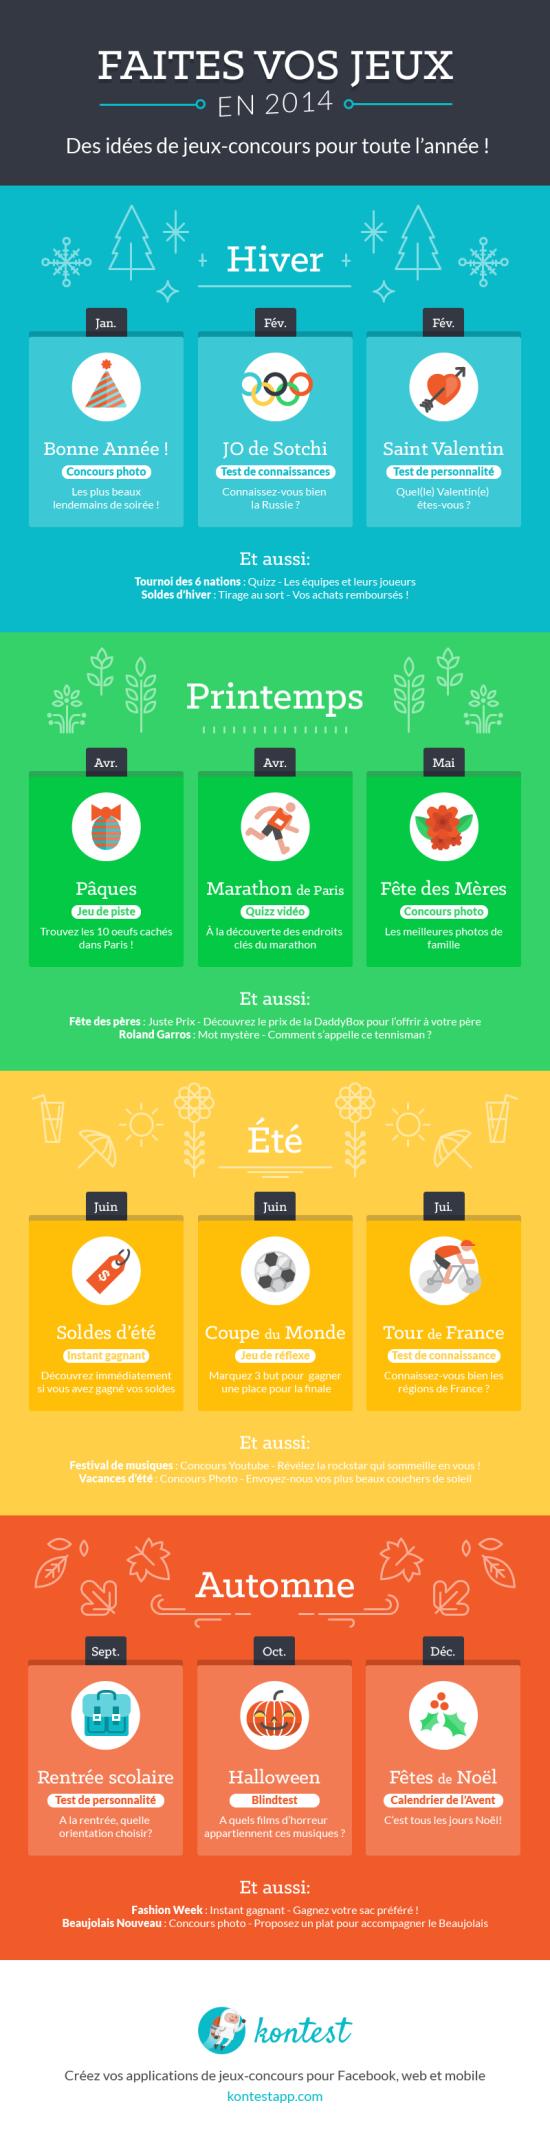 infographie kontest